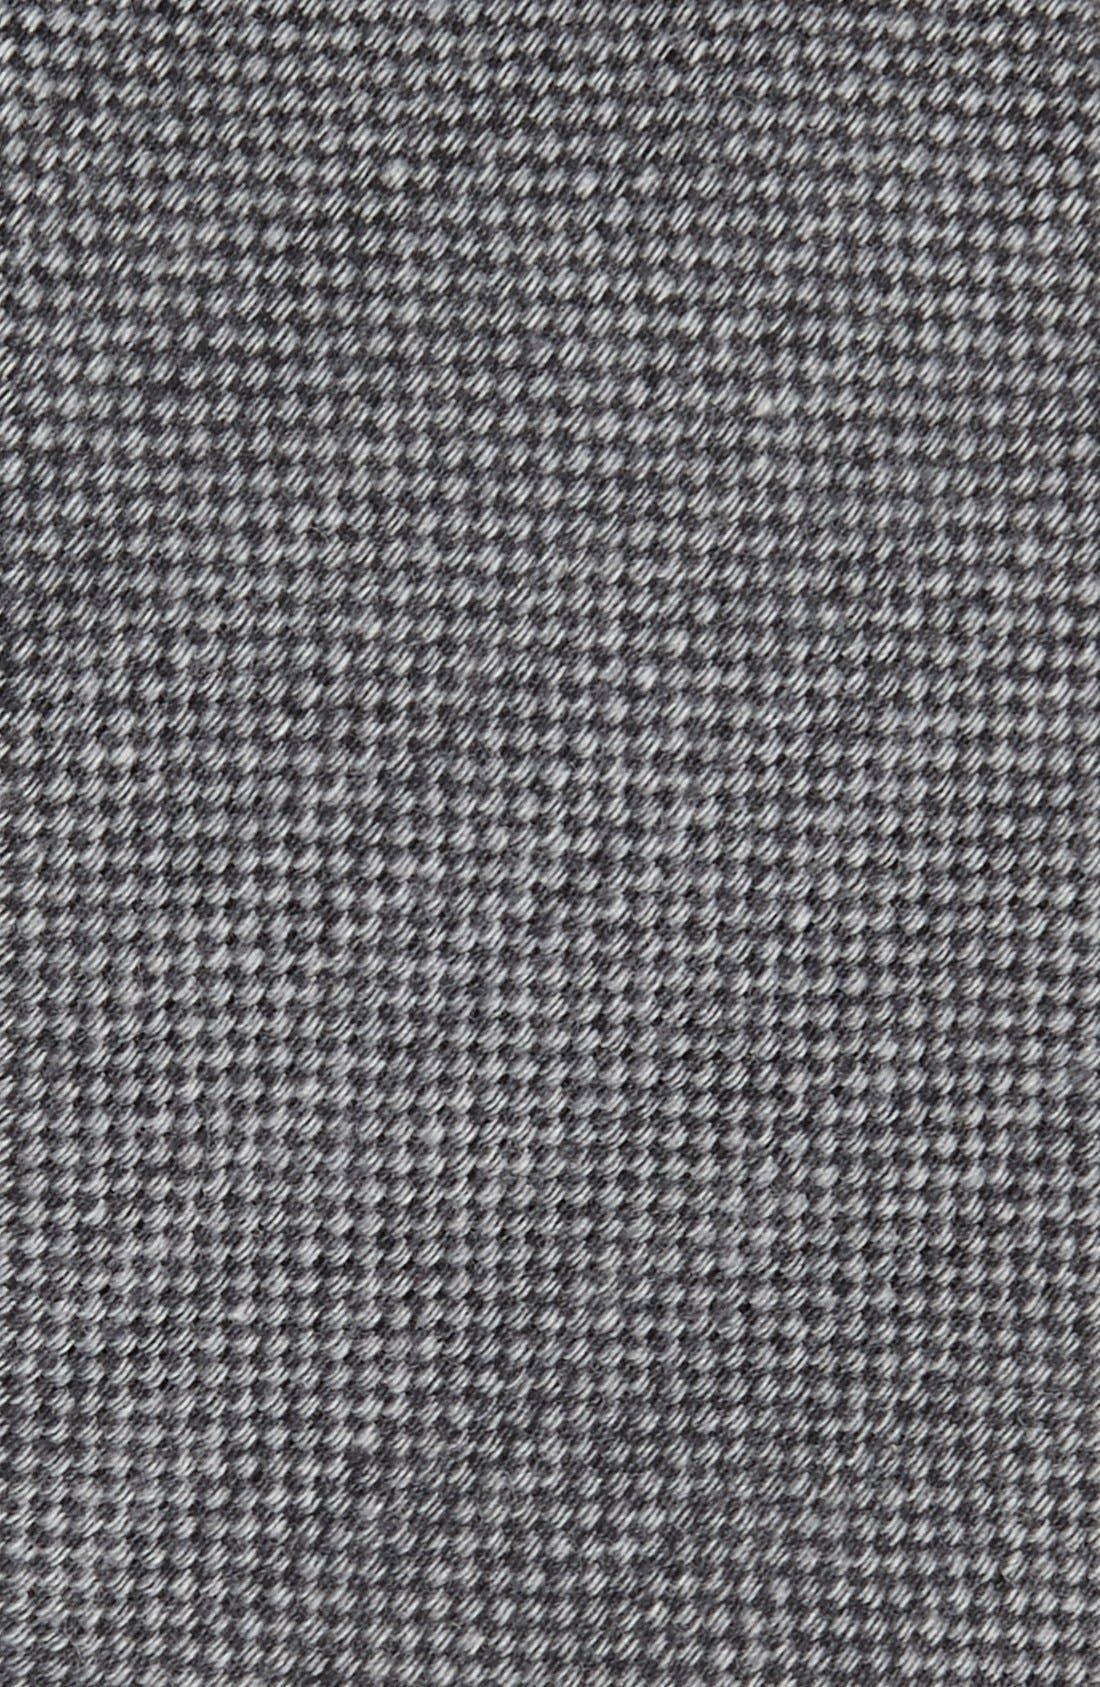 Alternate Image 2  - John W. Nordstrom Woven Wool Tie